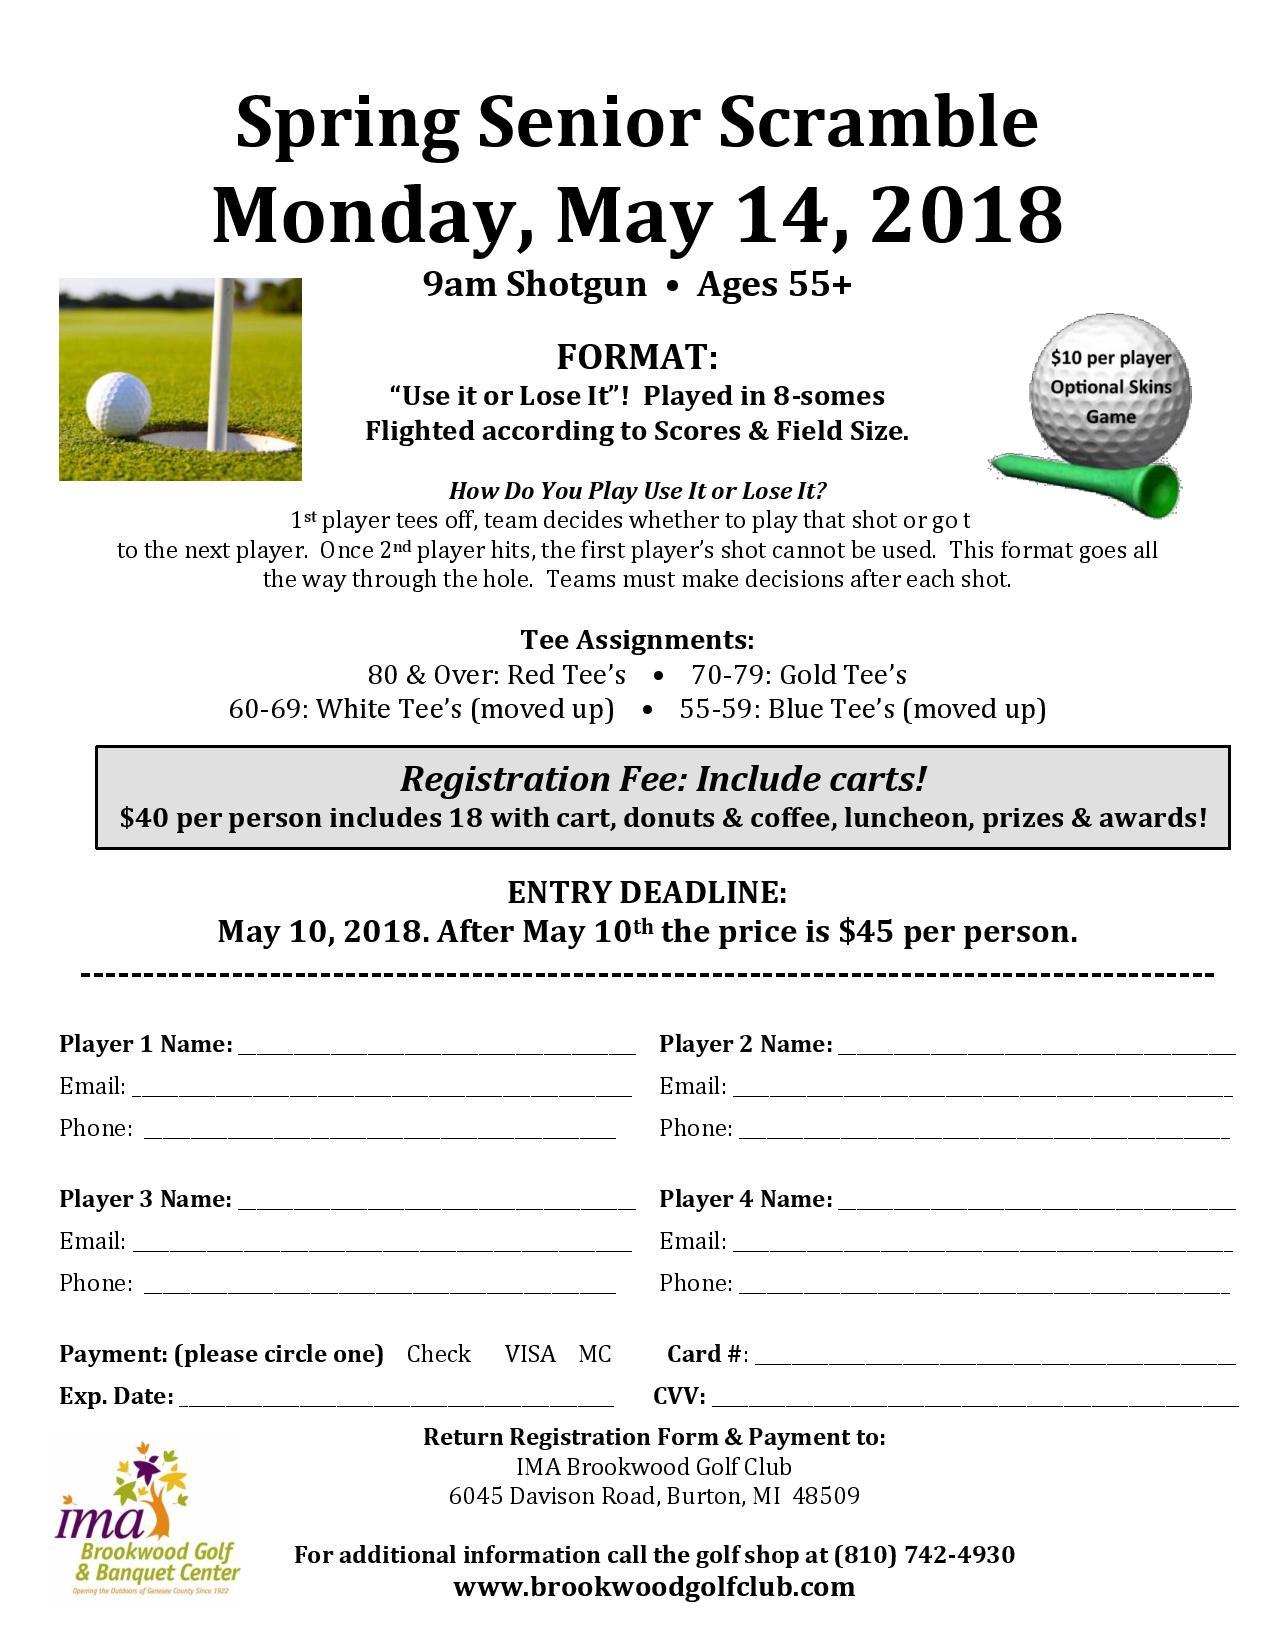 Spring Senior Scramble - IMA Brookwood Golf Club